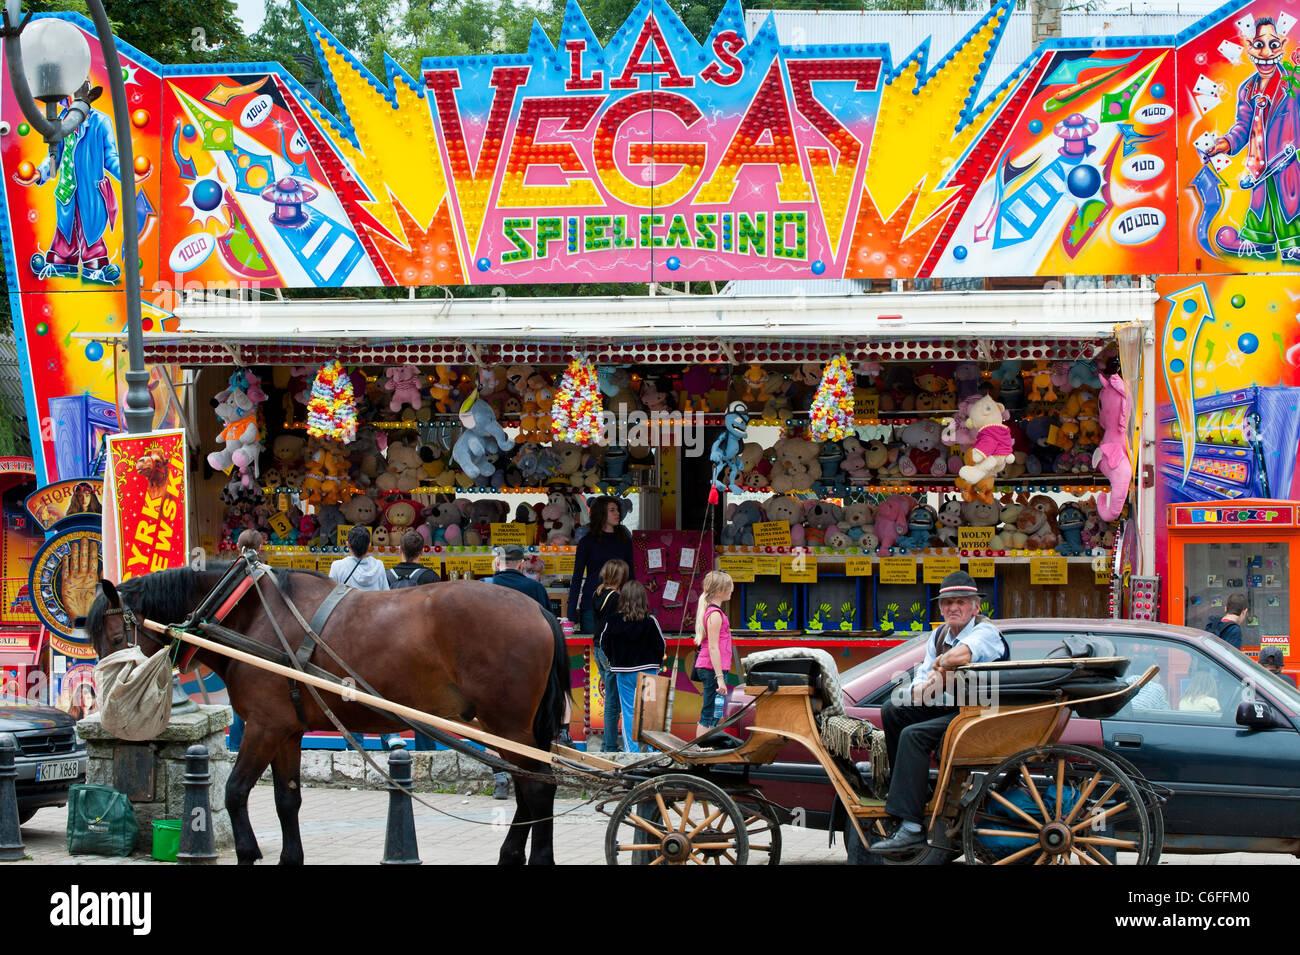 Emusement arcade, Zakopane, Podhale, Poland - Stock Image